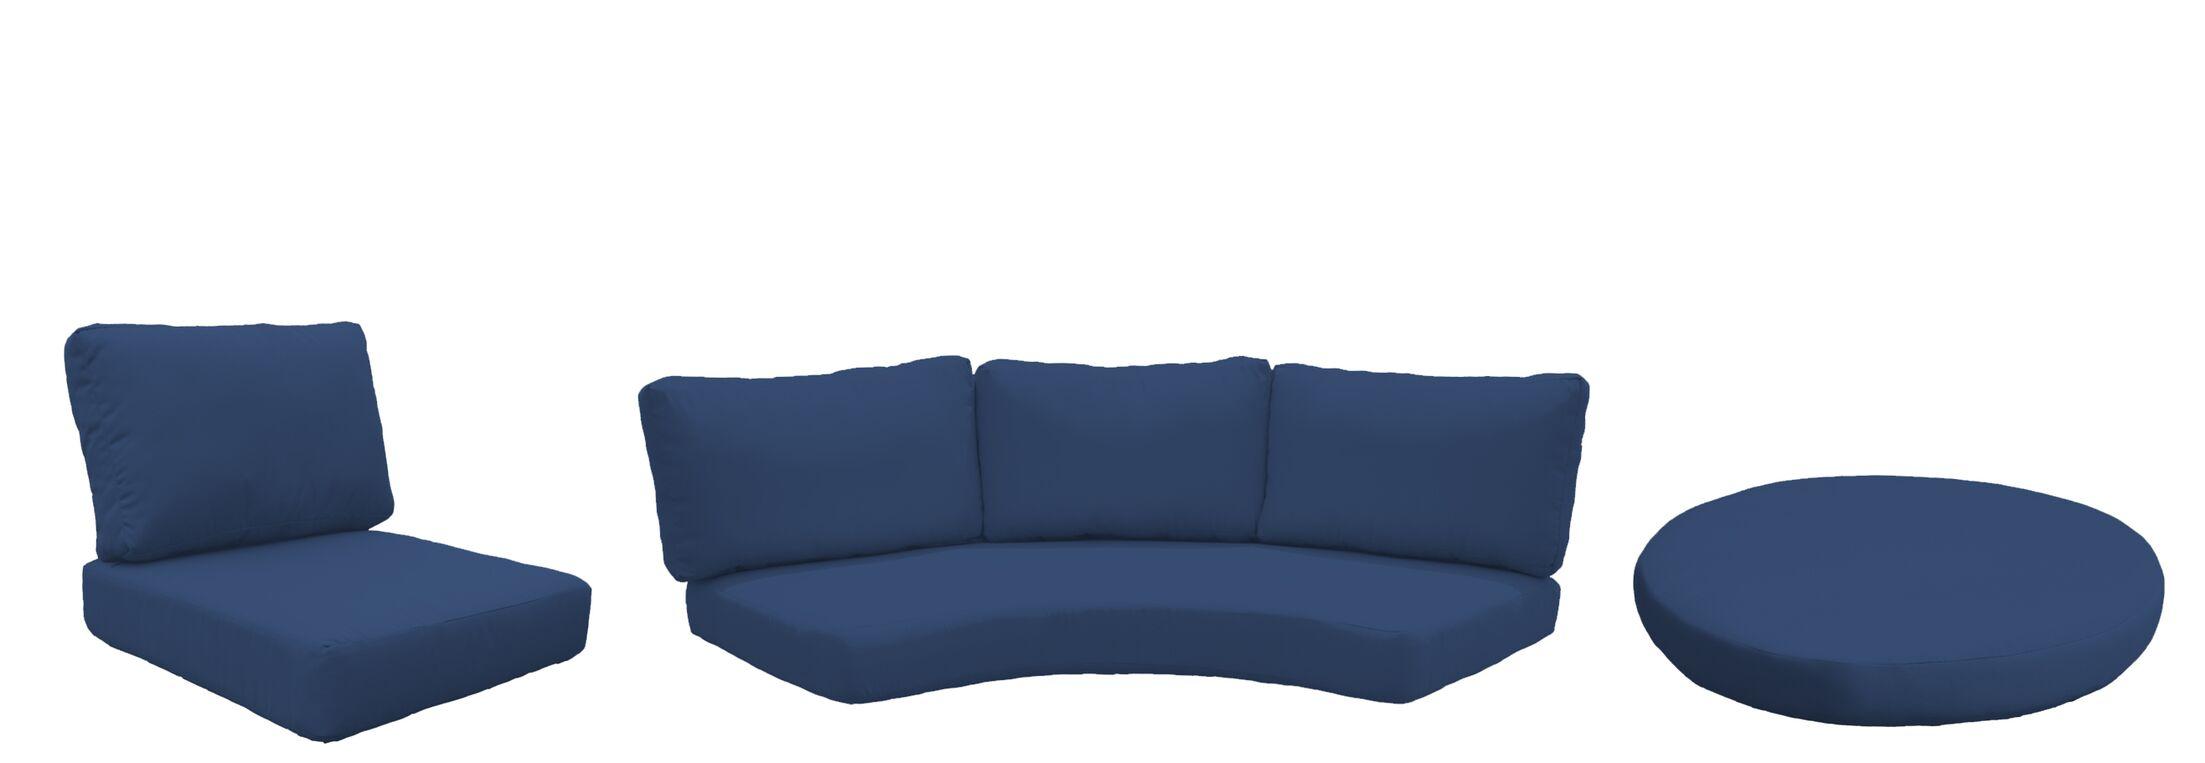 Fairmont 9 Piece Outdoor Cushion Set Fabric: Navy